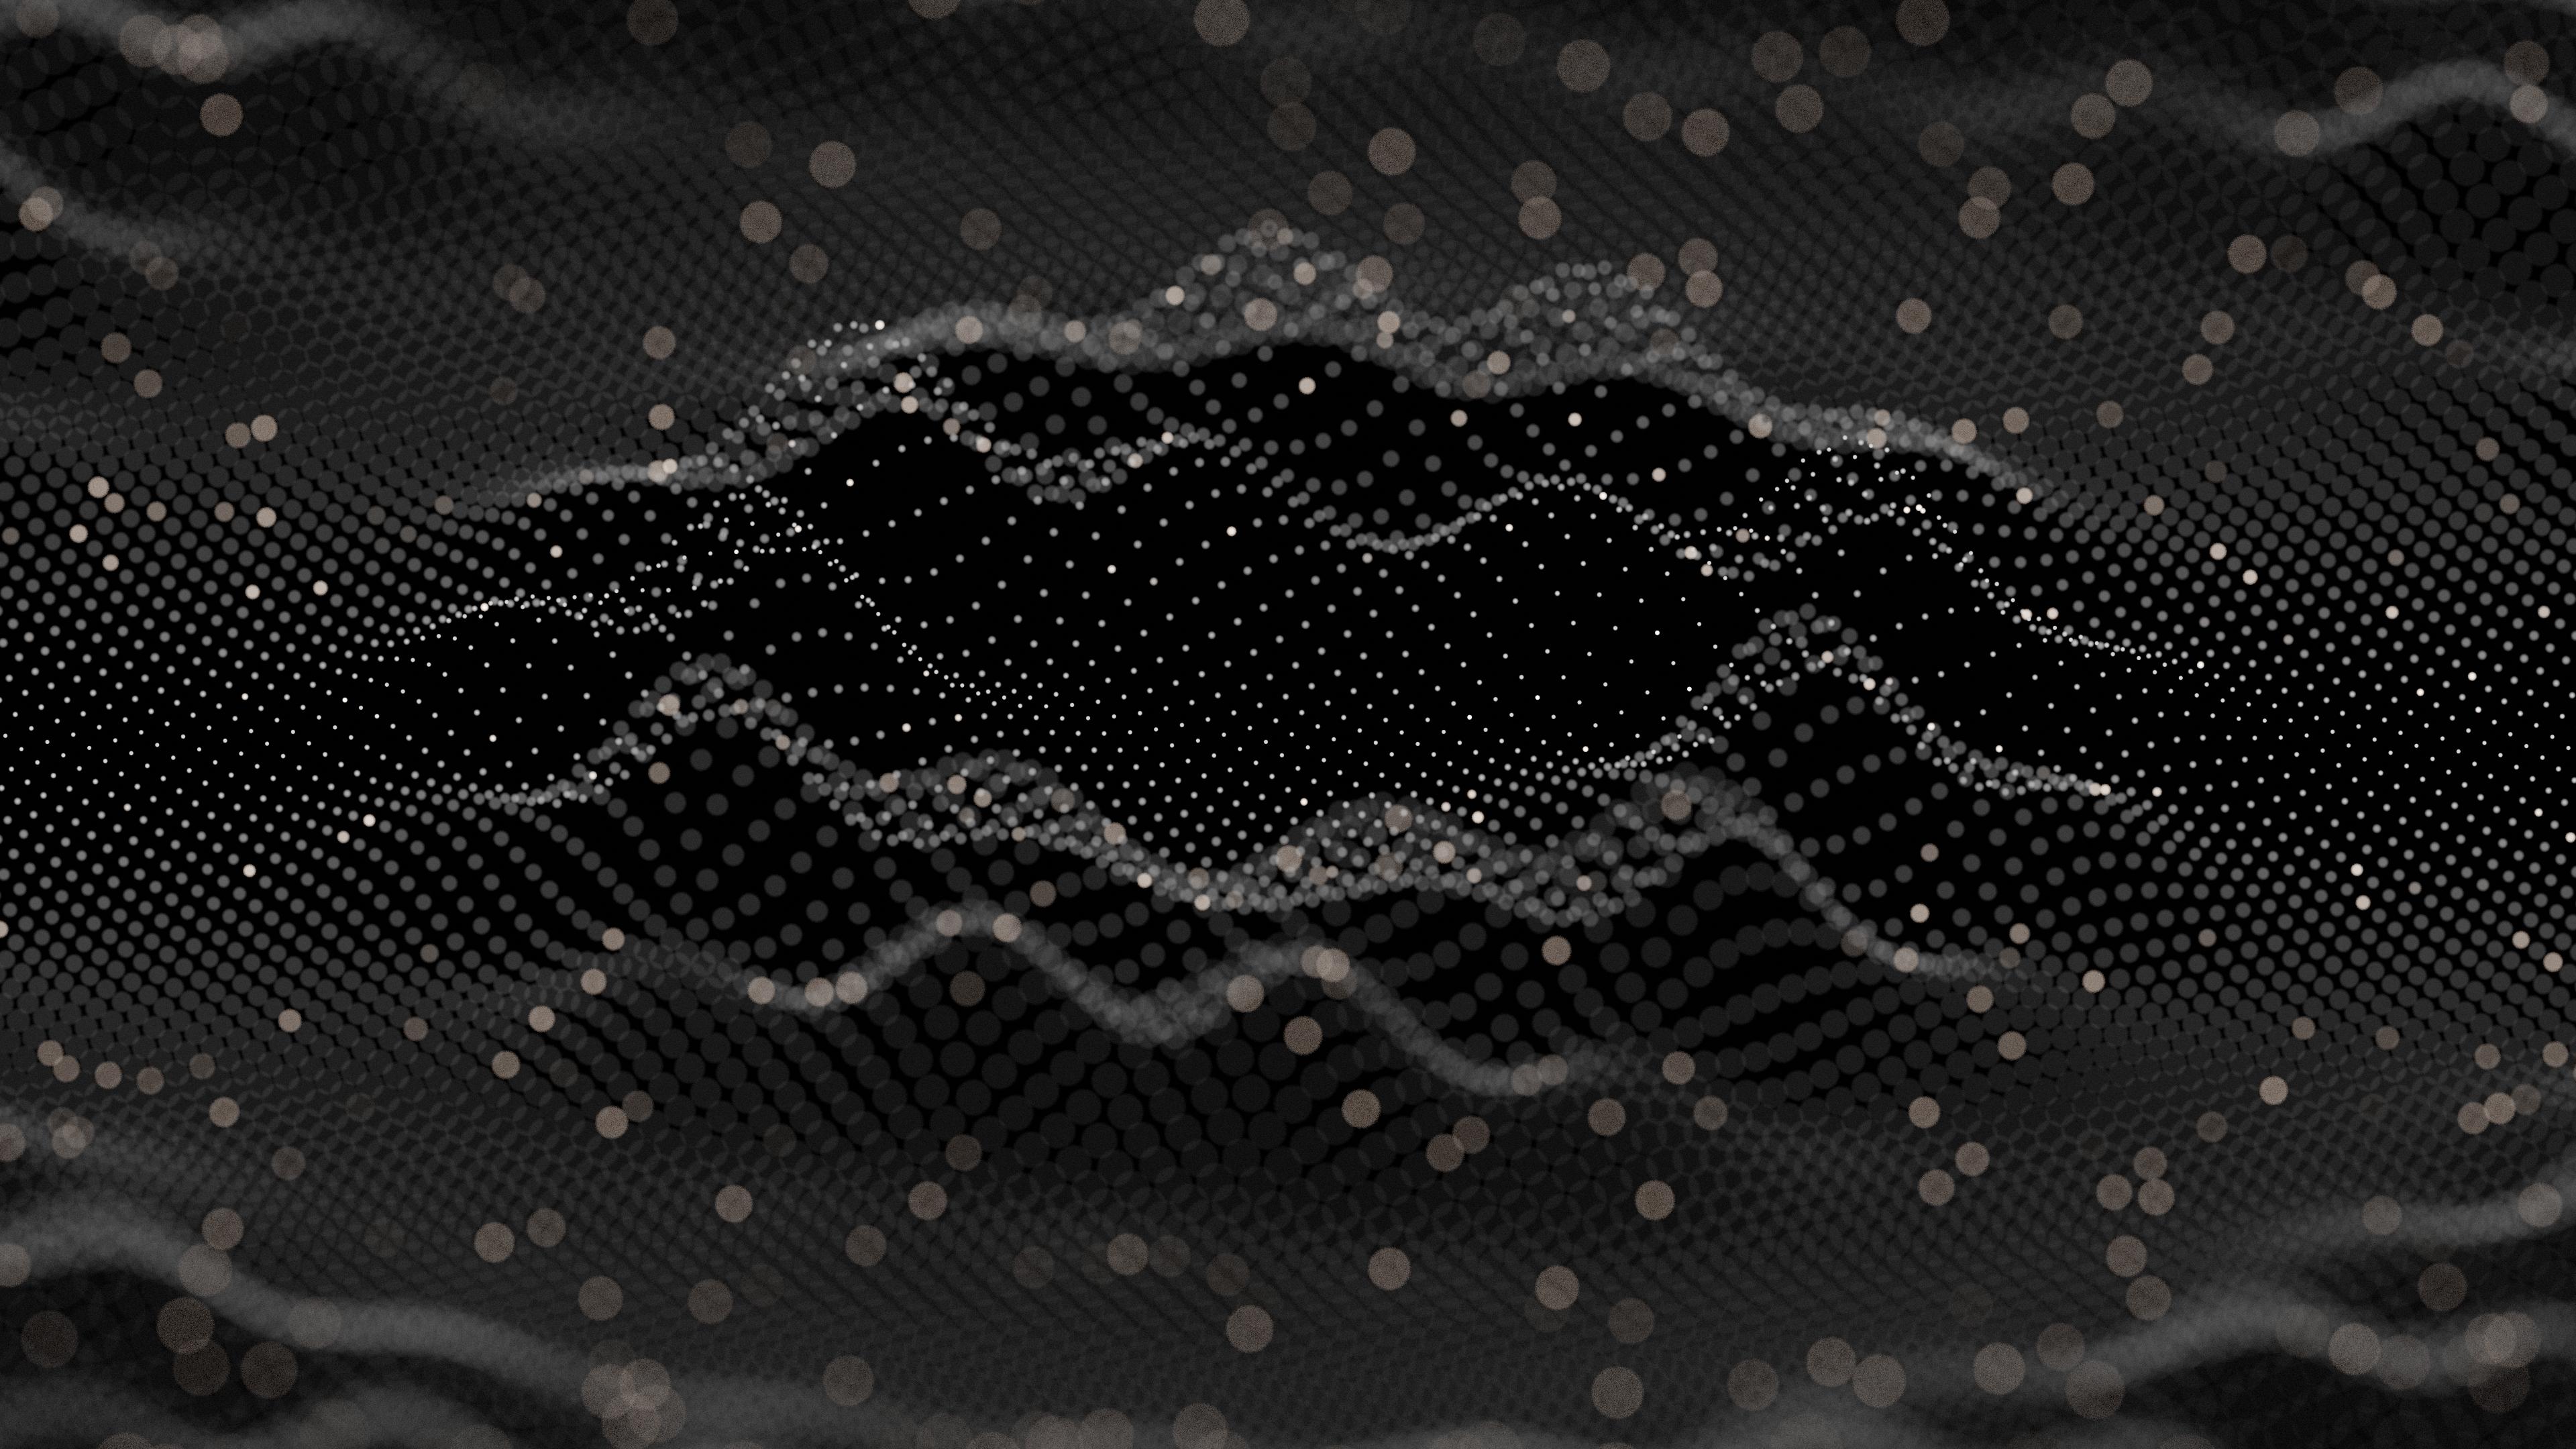 General 3840x2160 dark abstract grid tech